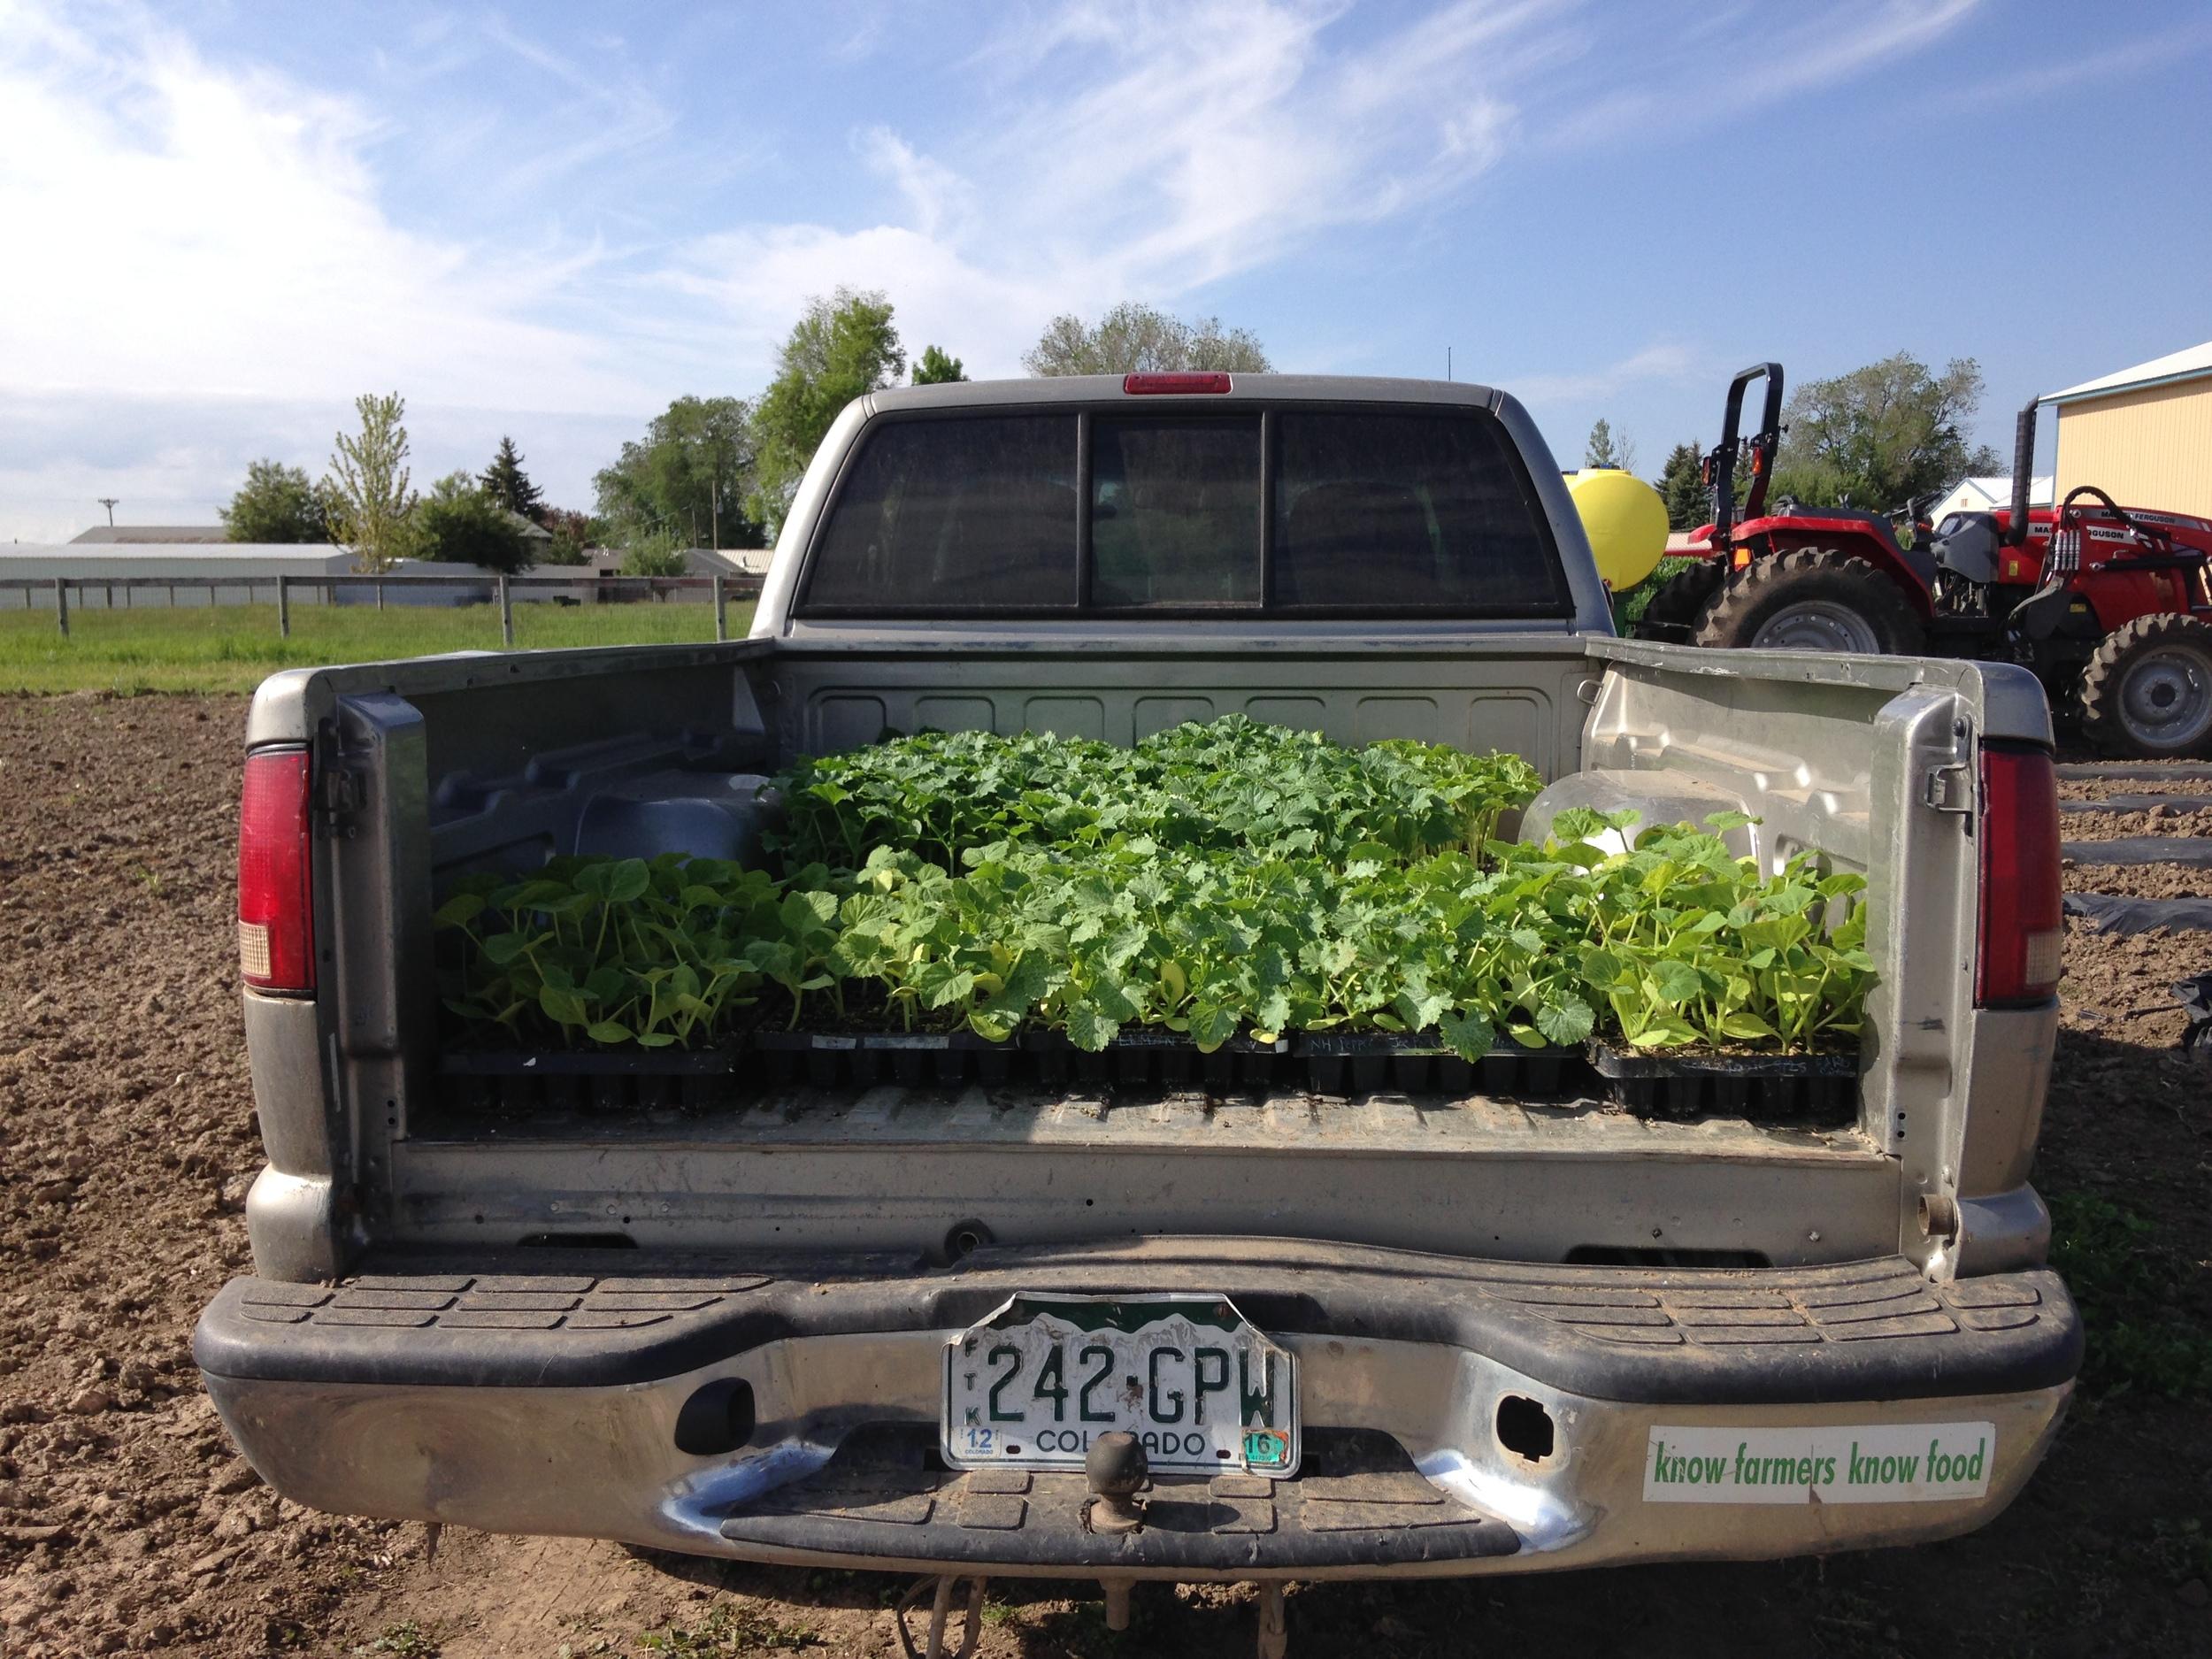 native-hill-farm-truck.jpg